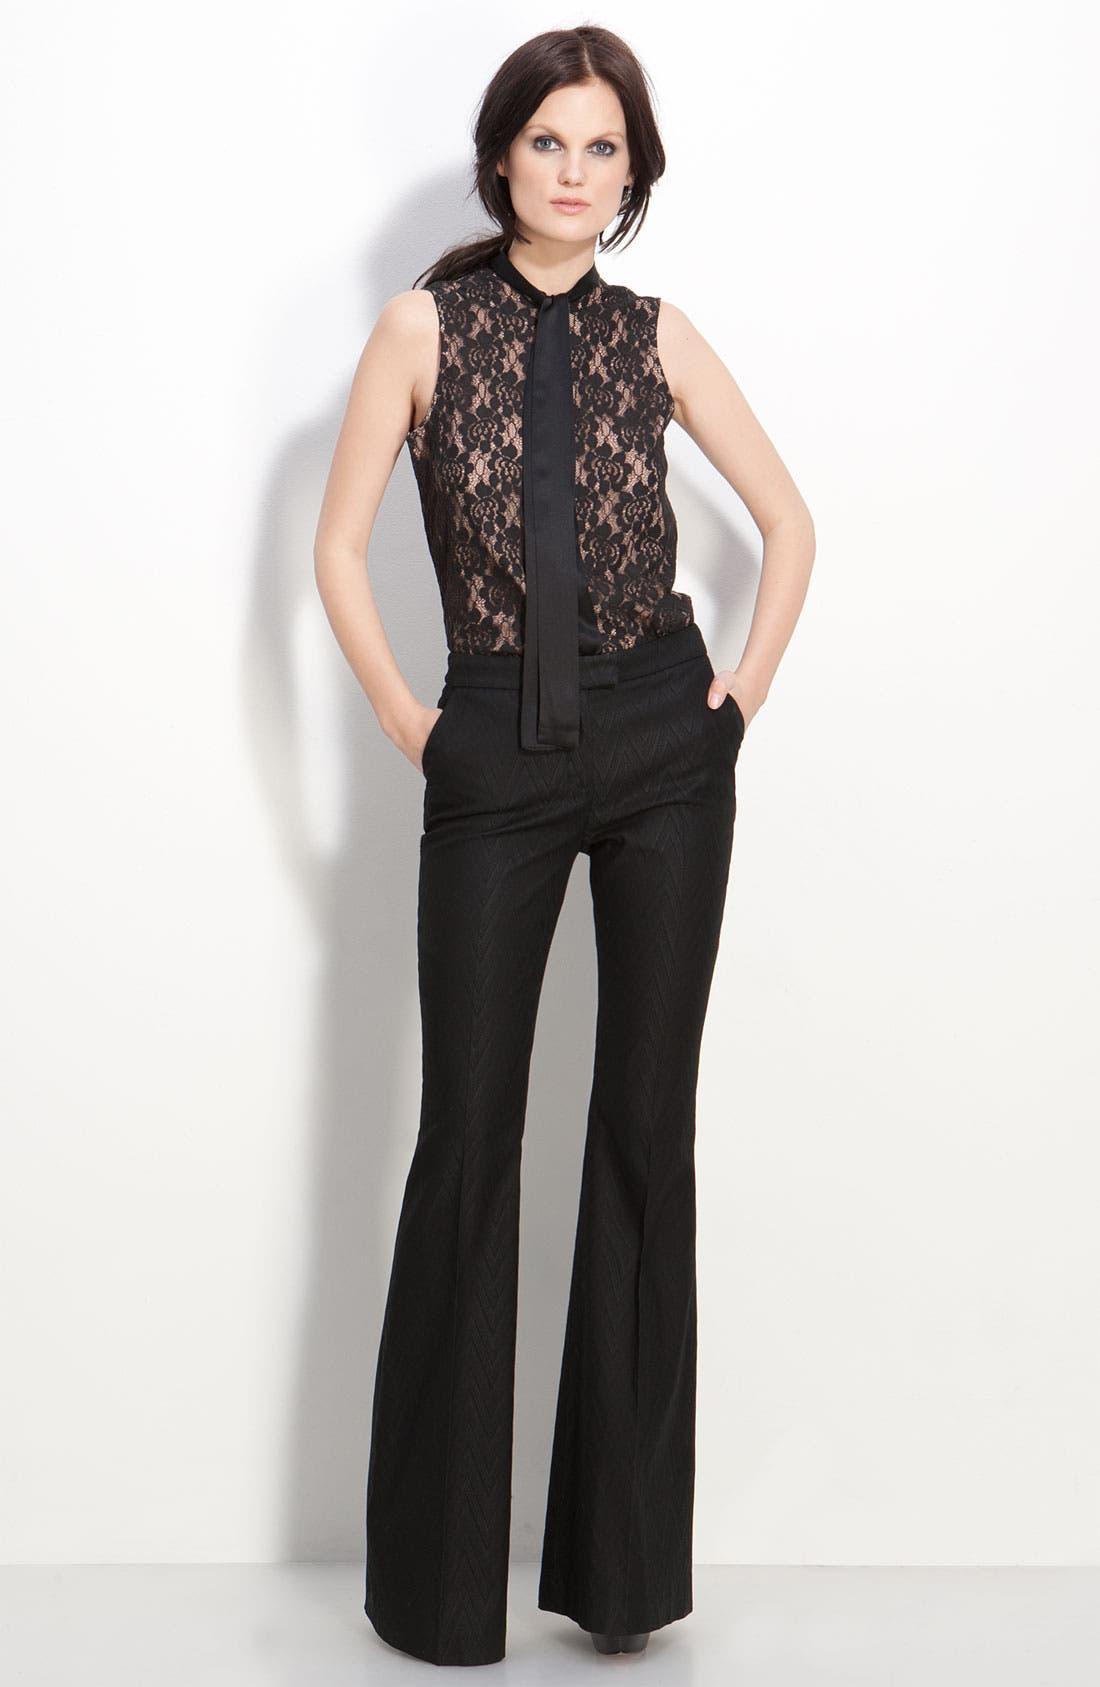 Alternate Image 1 Selected - Rachel Zoe 'Jessica' Tie Neck Sleeveless Blouse